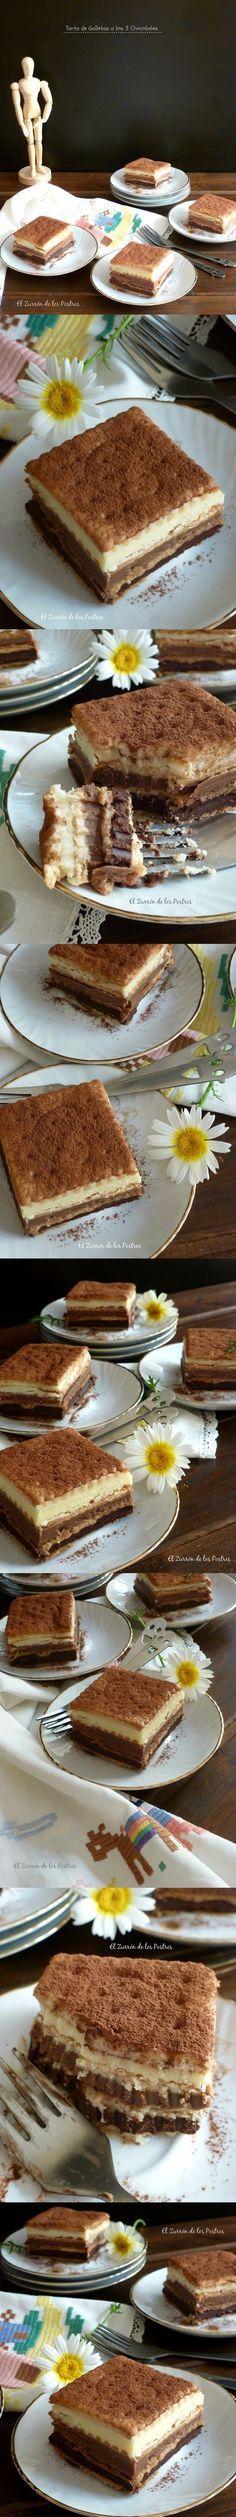 Apetecible tarta de galletas a los tres chocolates / http://www.elzurrondelospostres.com/